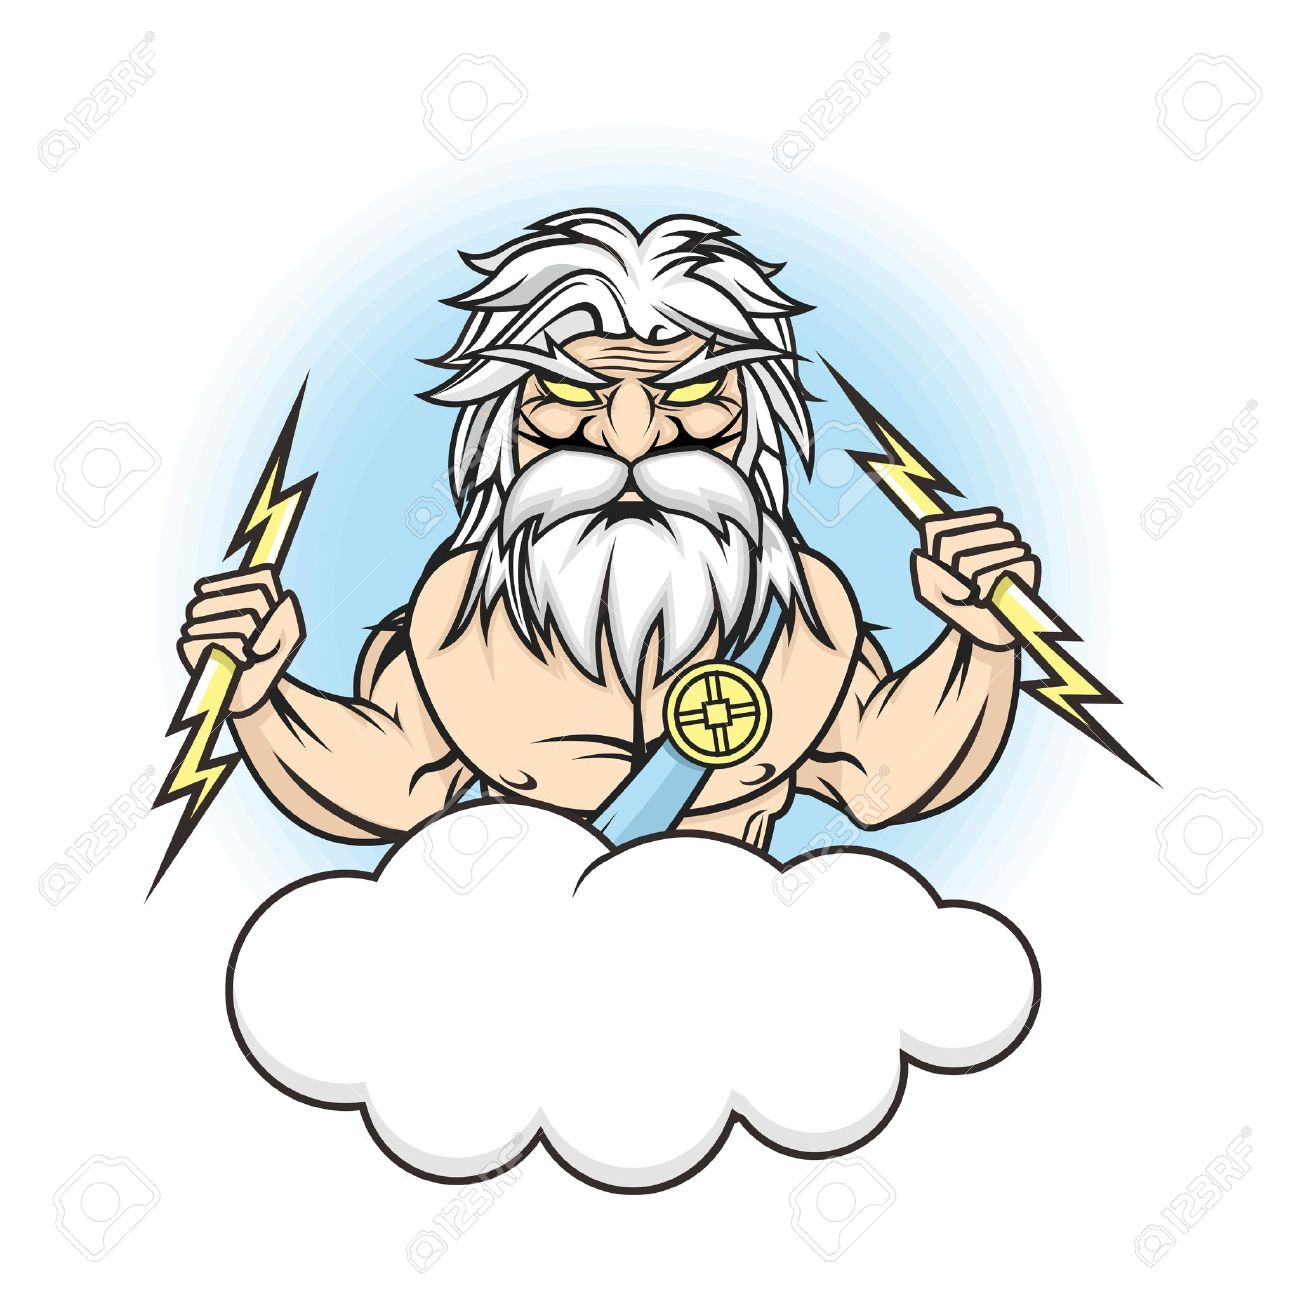 Zeus Cartoon Drawing at GetDrawings.com.